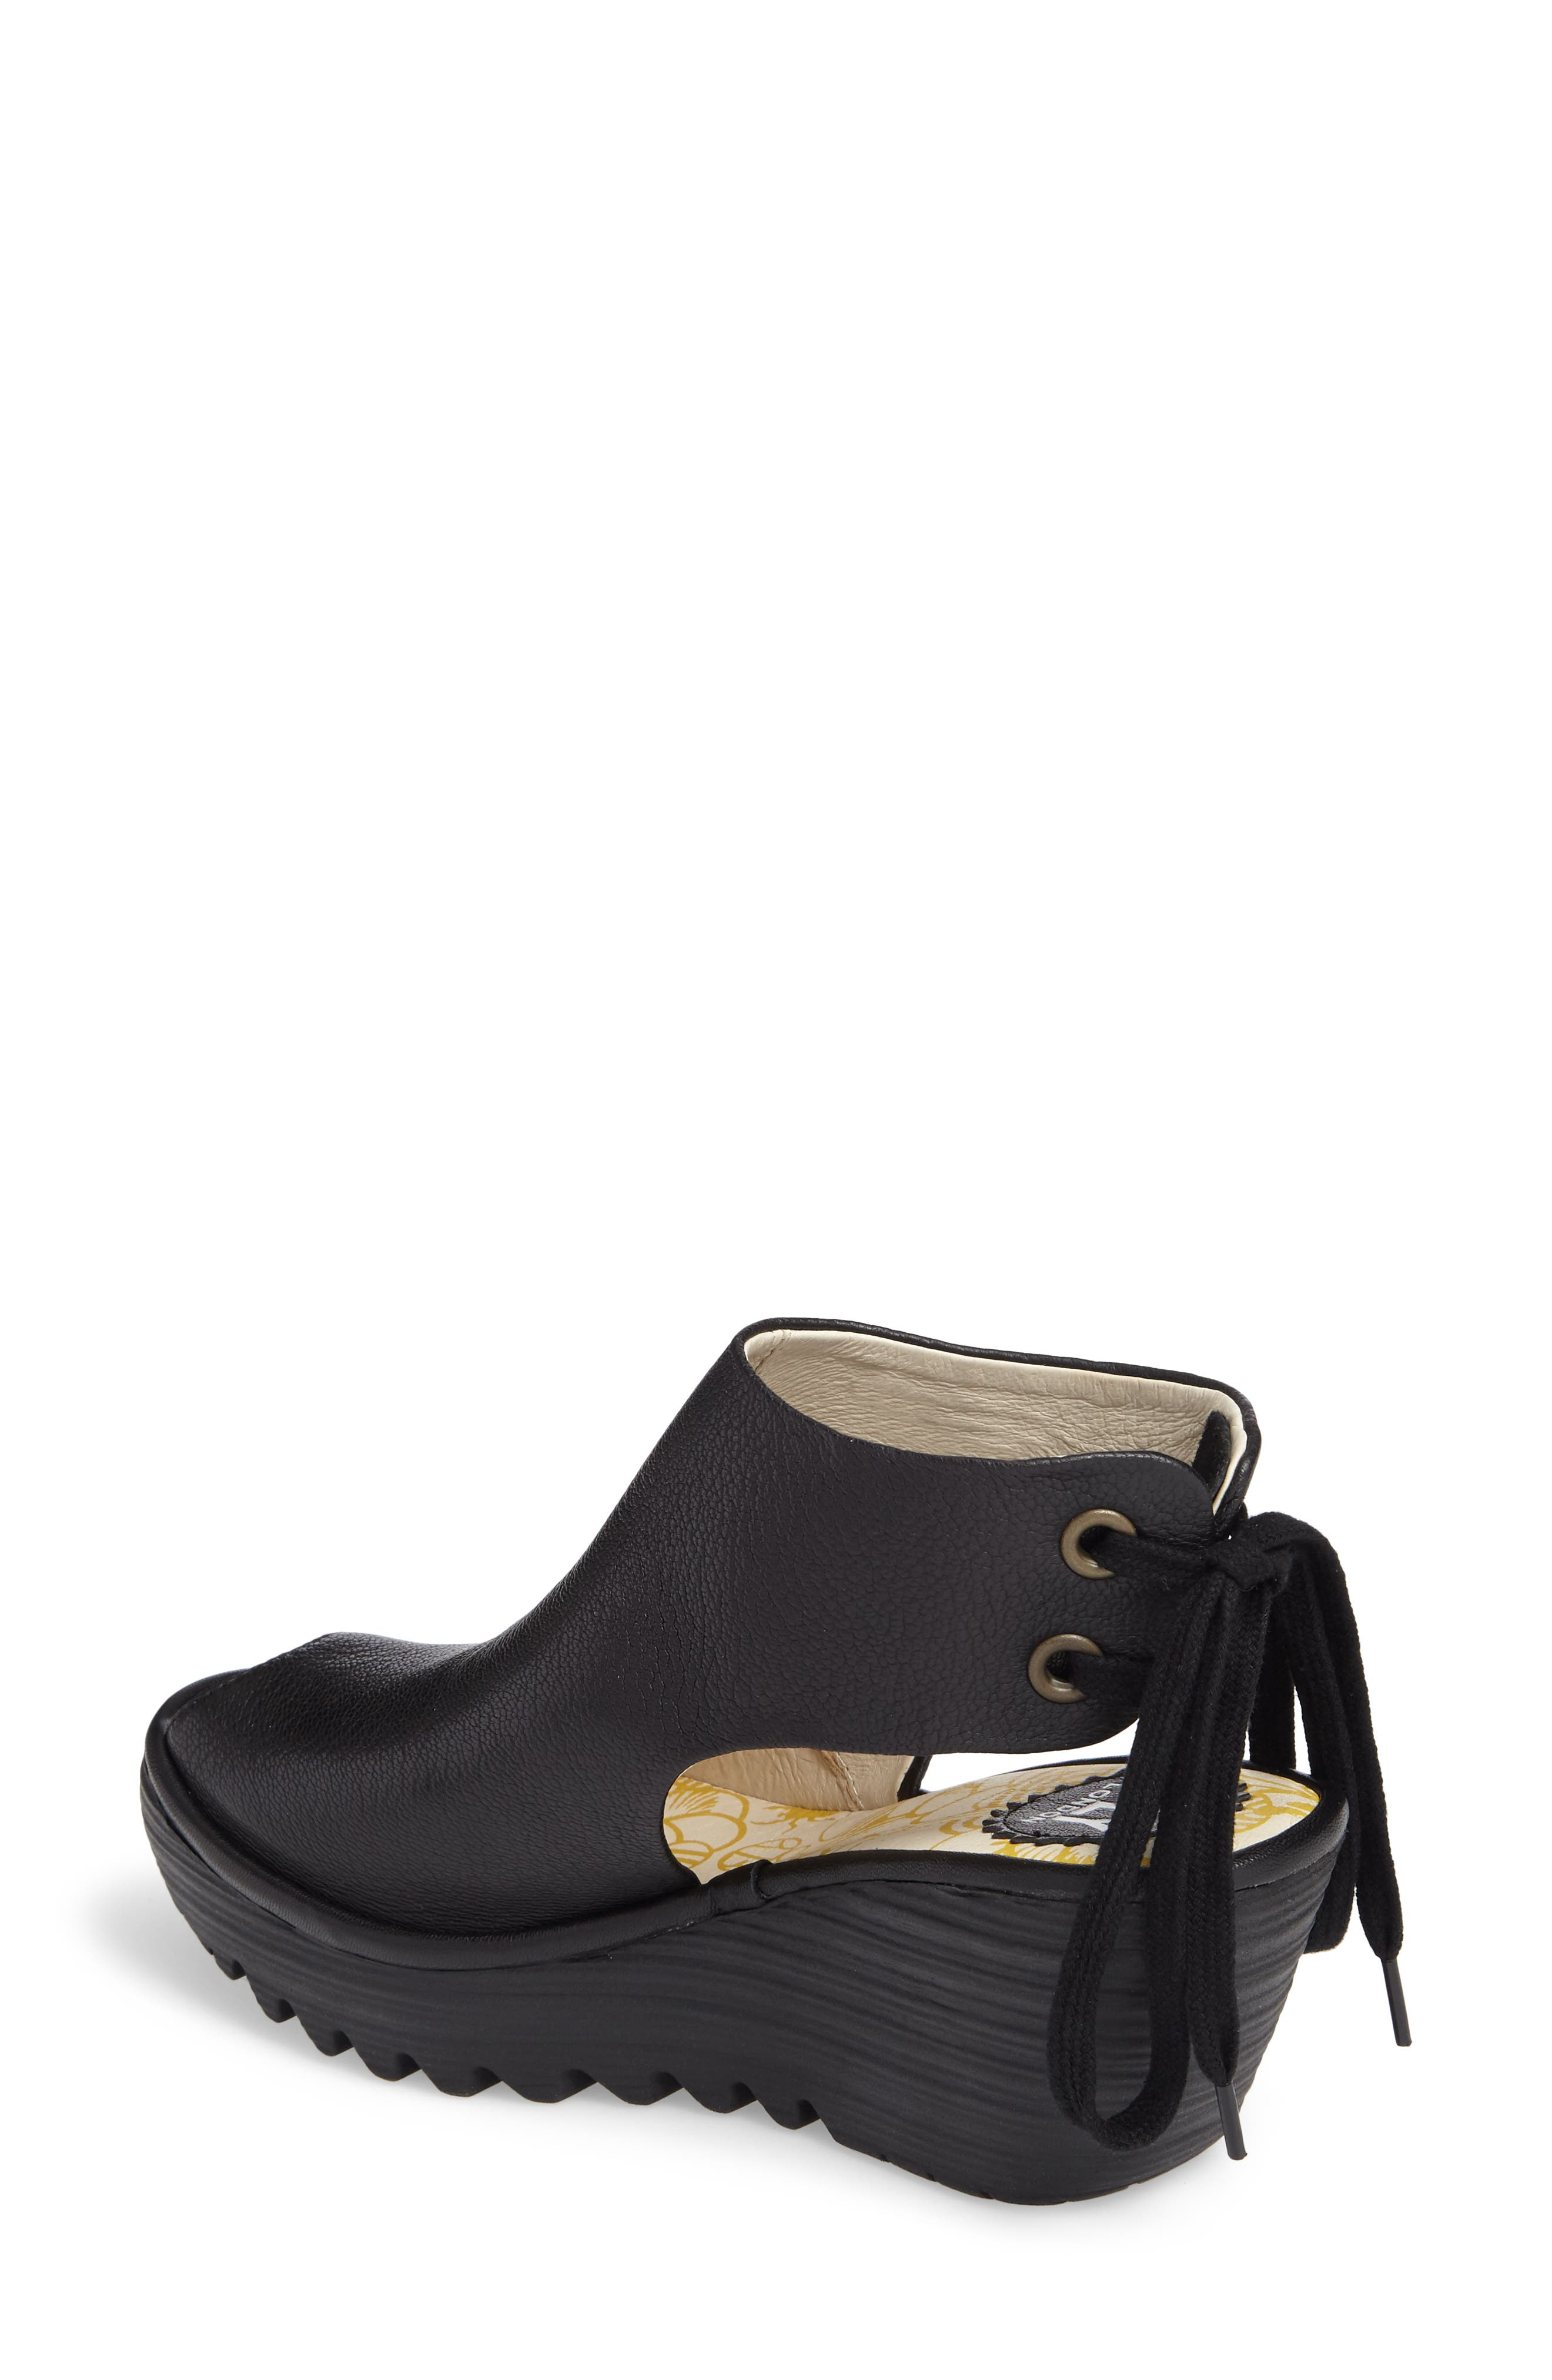 Yuzu Wedge Sandal,                             Alternate thumbnail 2, color,                             Black Mousse Leather